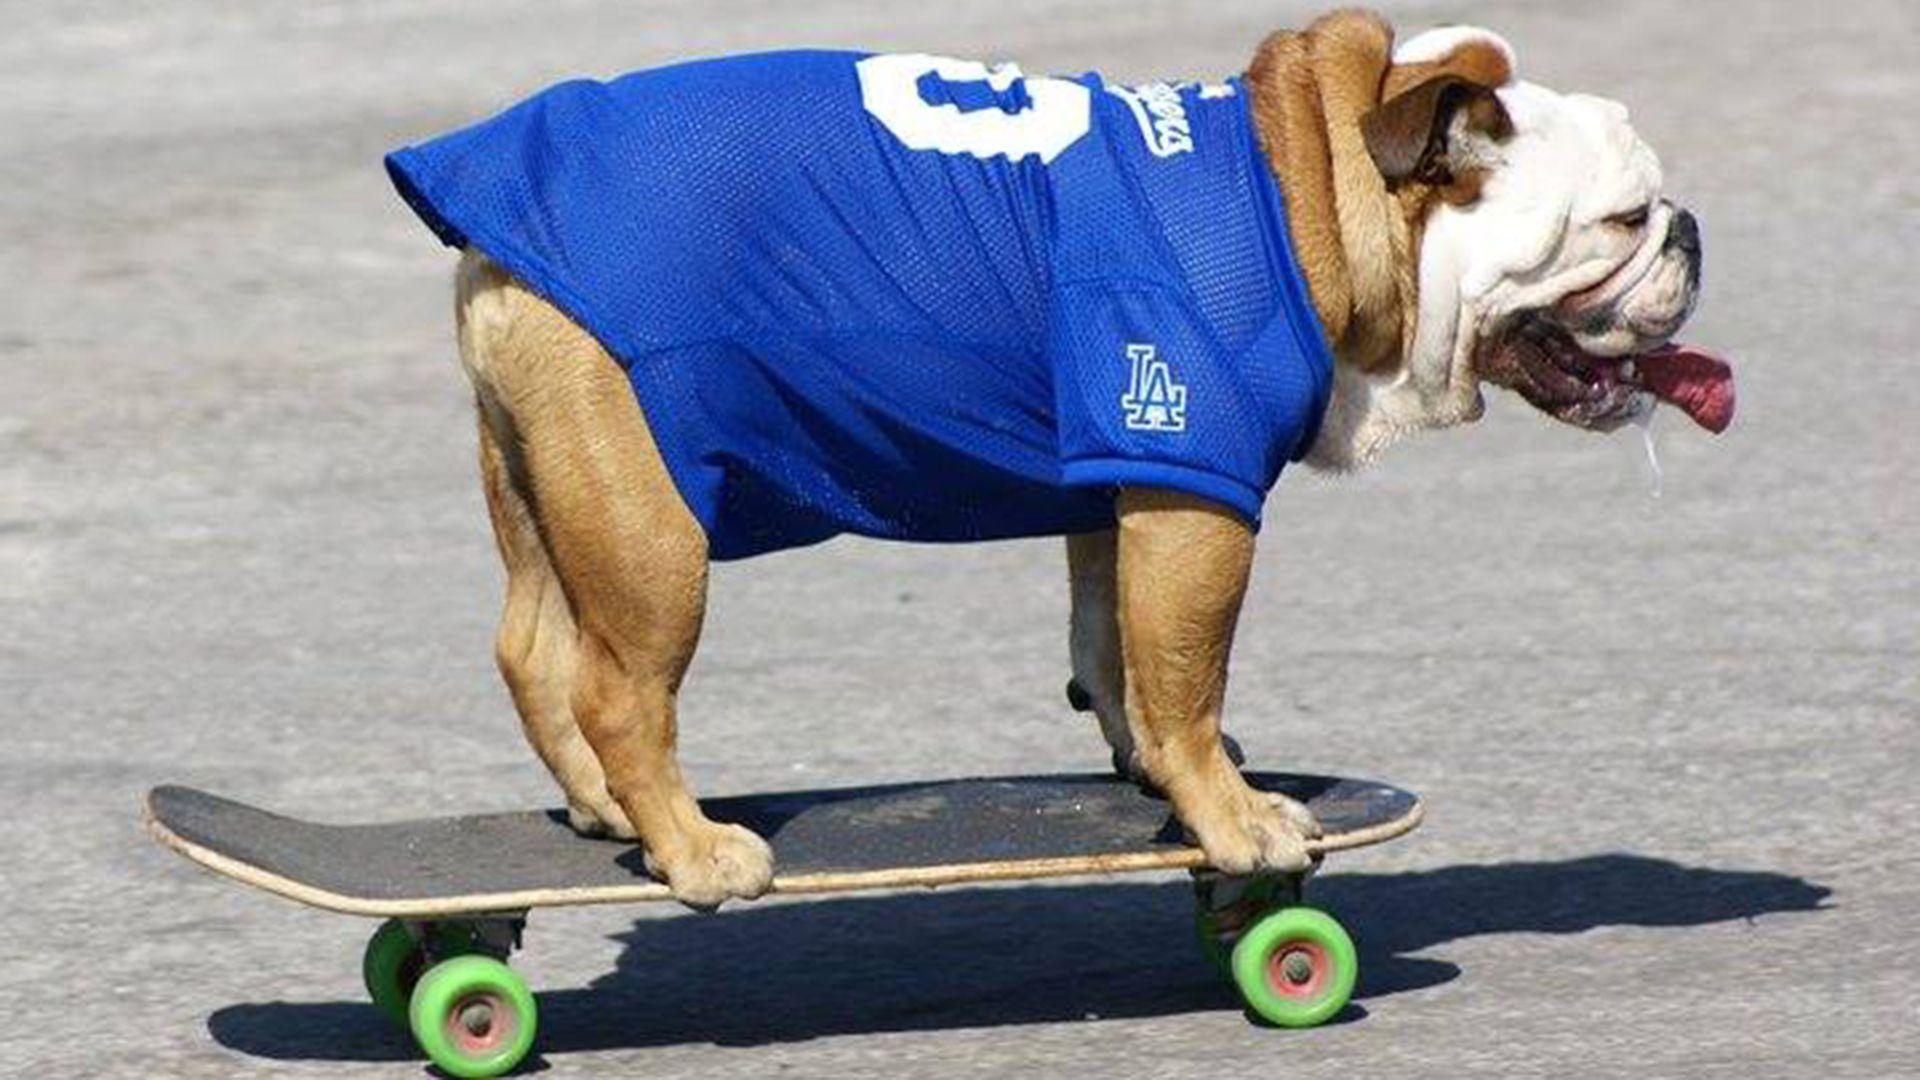 Tillman The World Record Holding Skateboarding Dog Dies English Bulldog Skateboard Bulldog